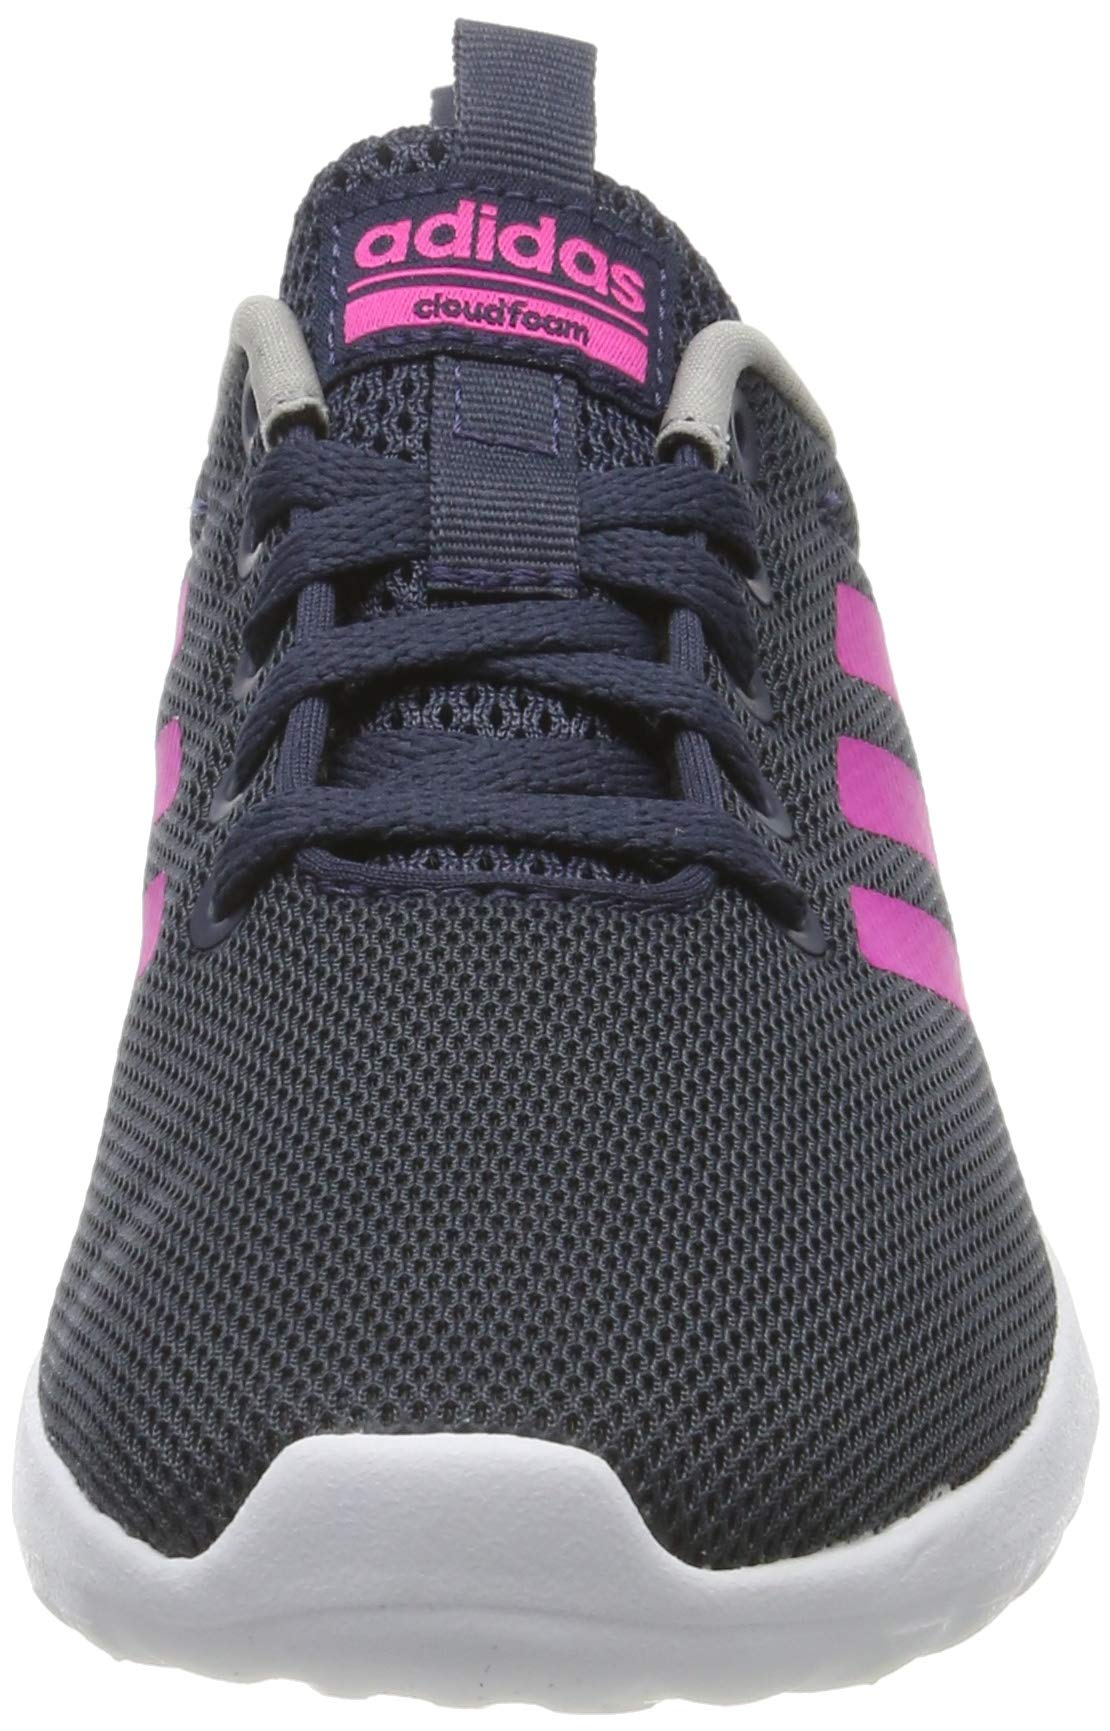 adidas Lite Racer CLN K, Scarpe da Fitness Unisex – Bambini 4 spesavip